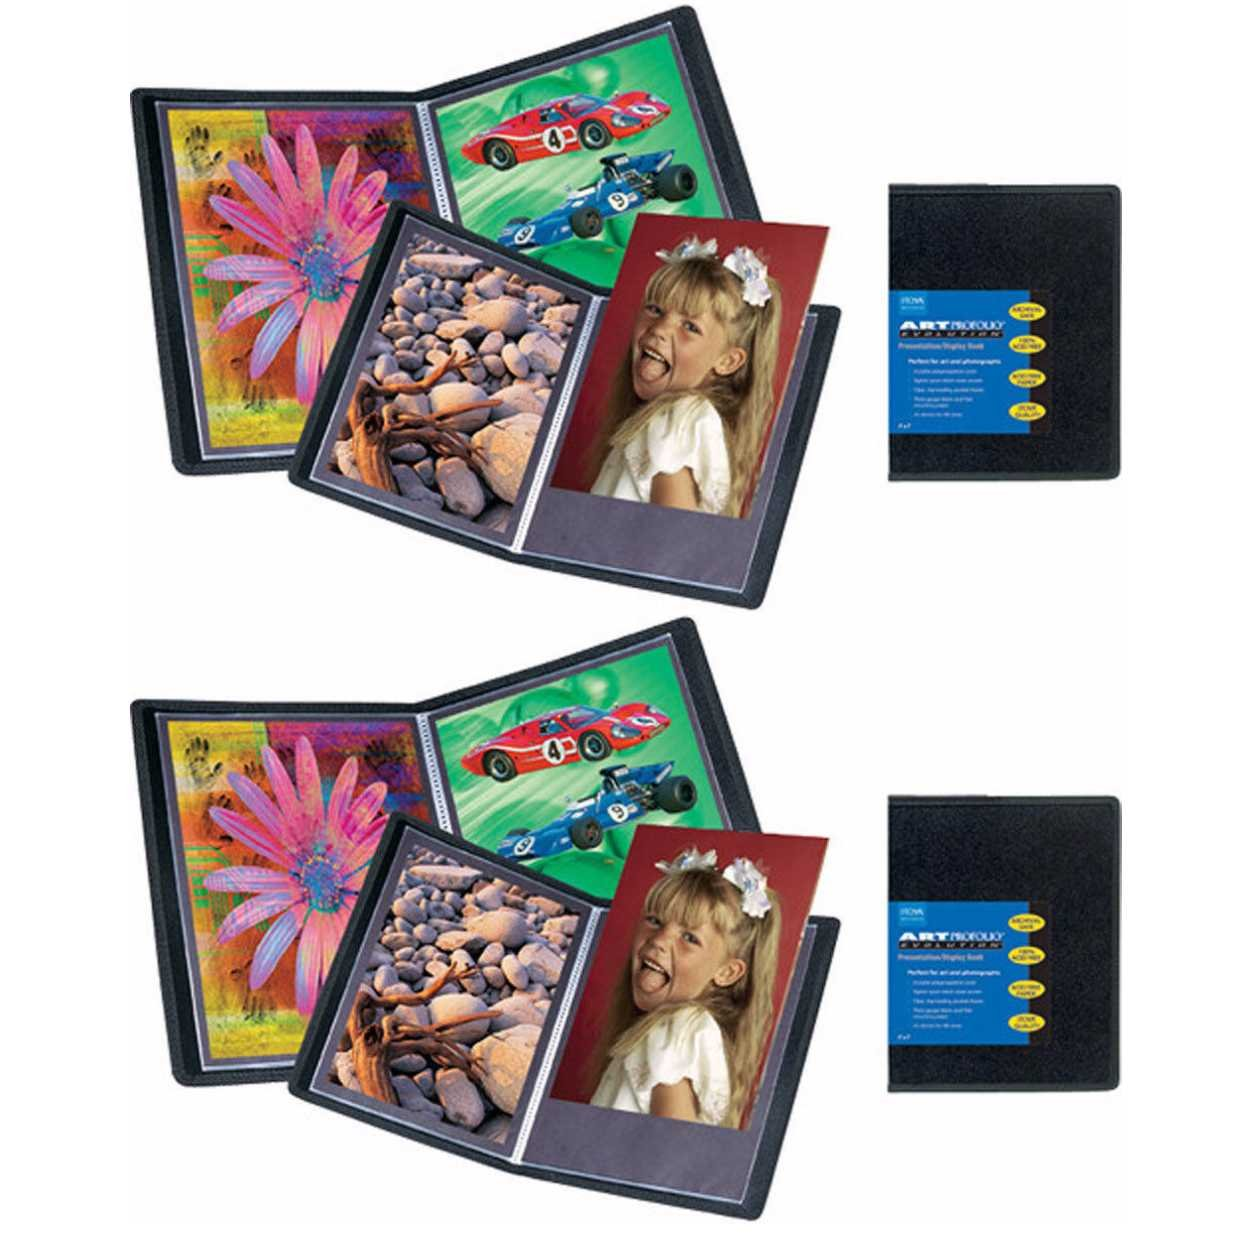 ITOYA Art Profolio Evolution 16'' x 20'' Presentation/Display Book 2-Pack